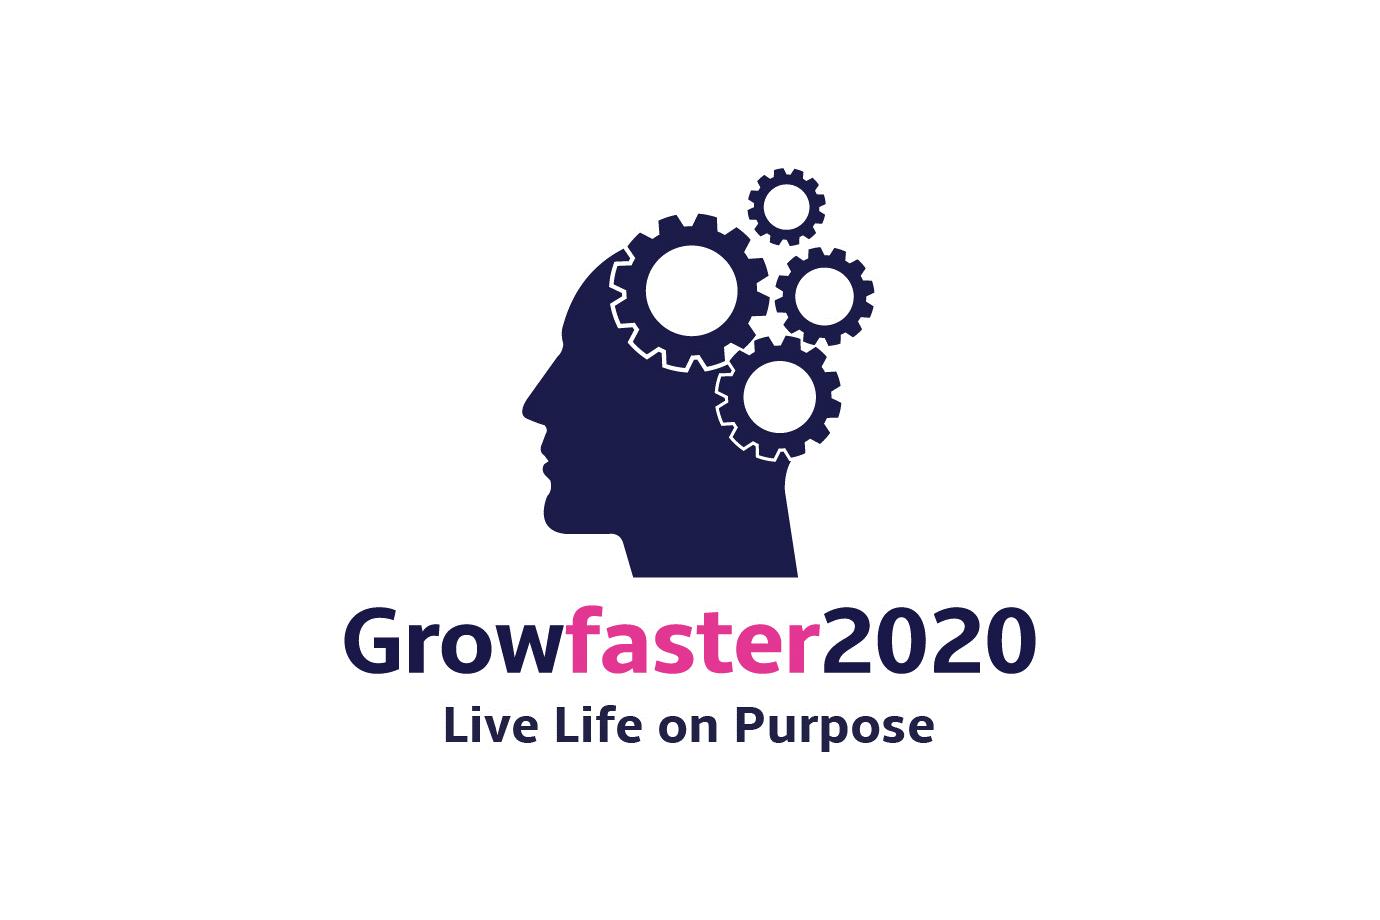 Growfaster2020 logo